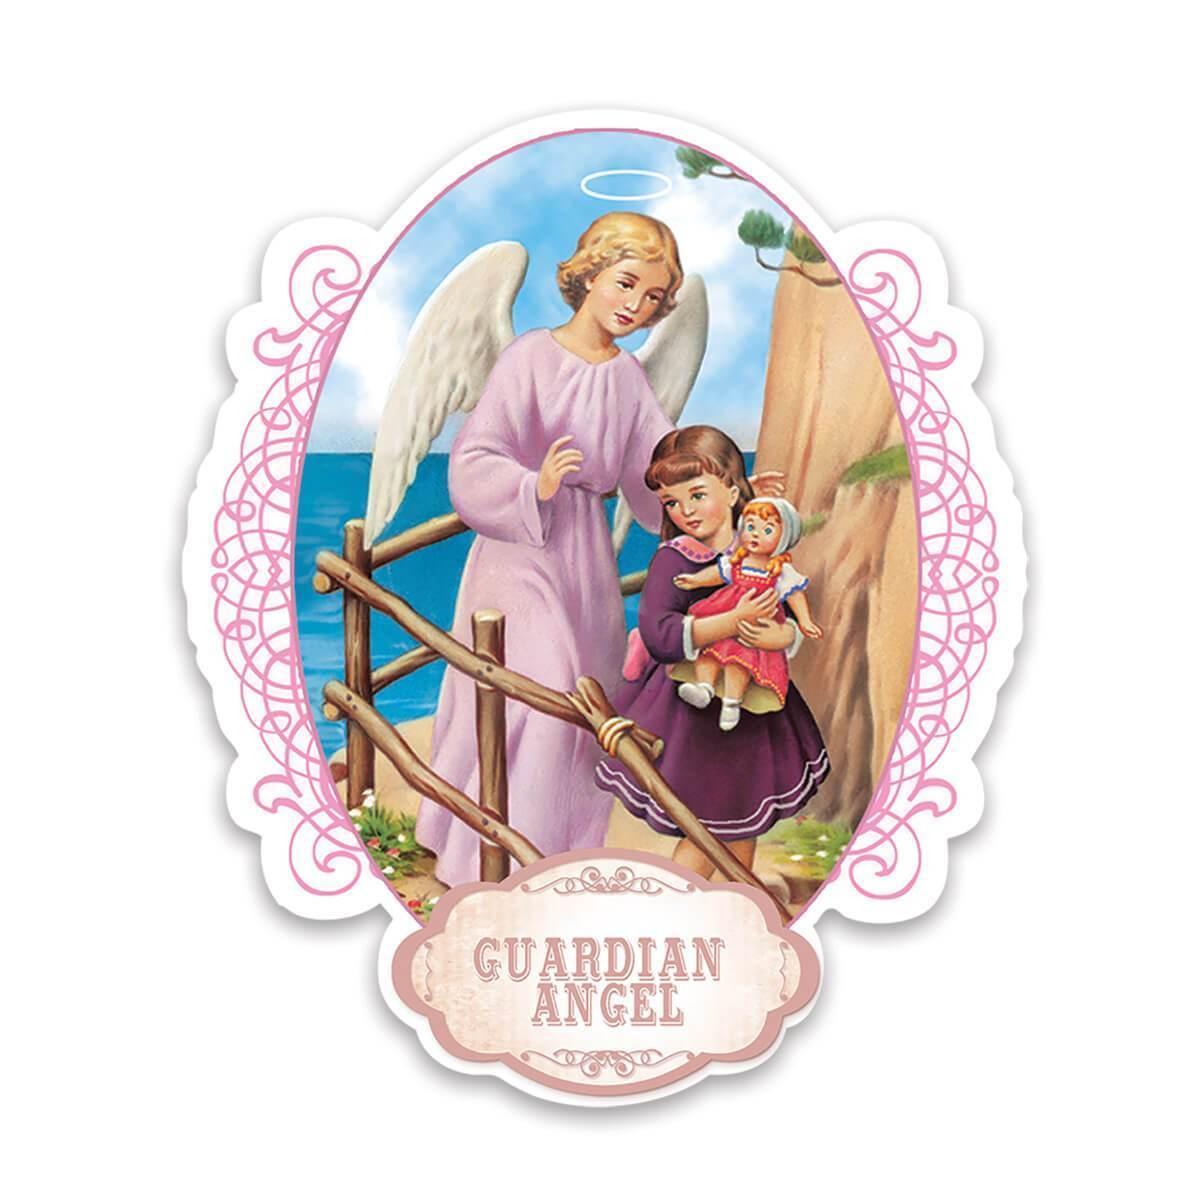 Guardian Angel : Gift Sticker Catholic Religious Saint Girl Kids